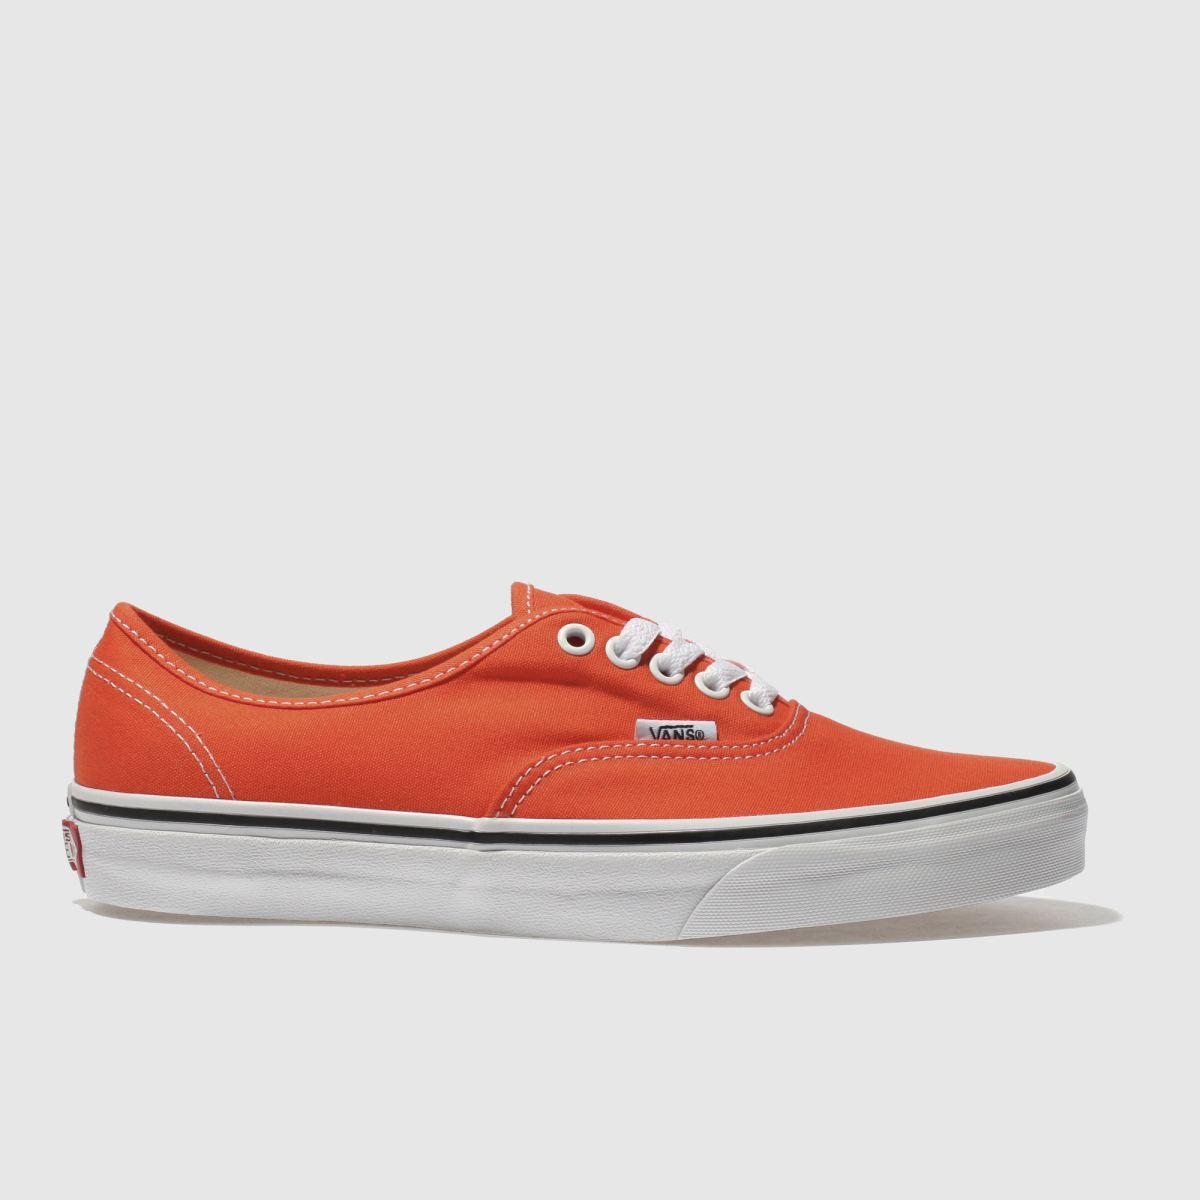 Vans Orange Authentic Canvas Trainers